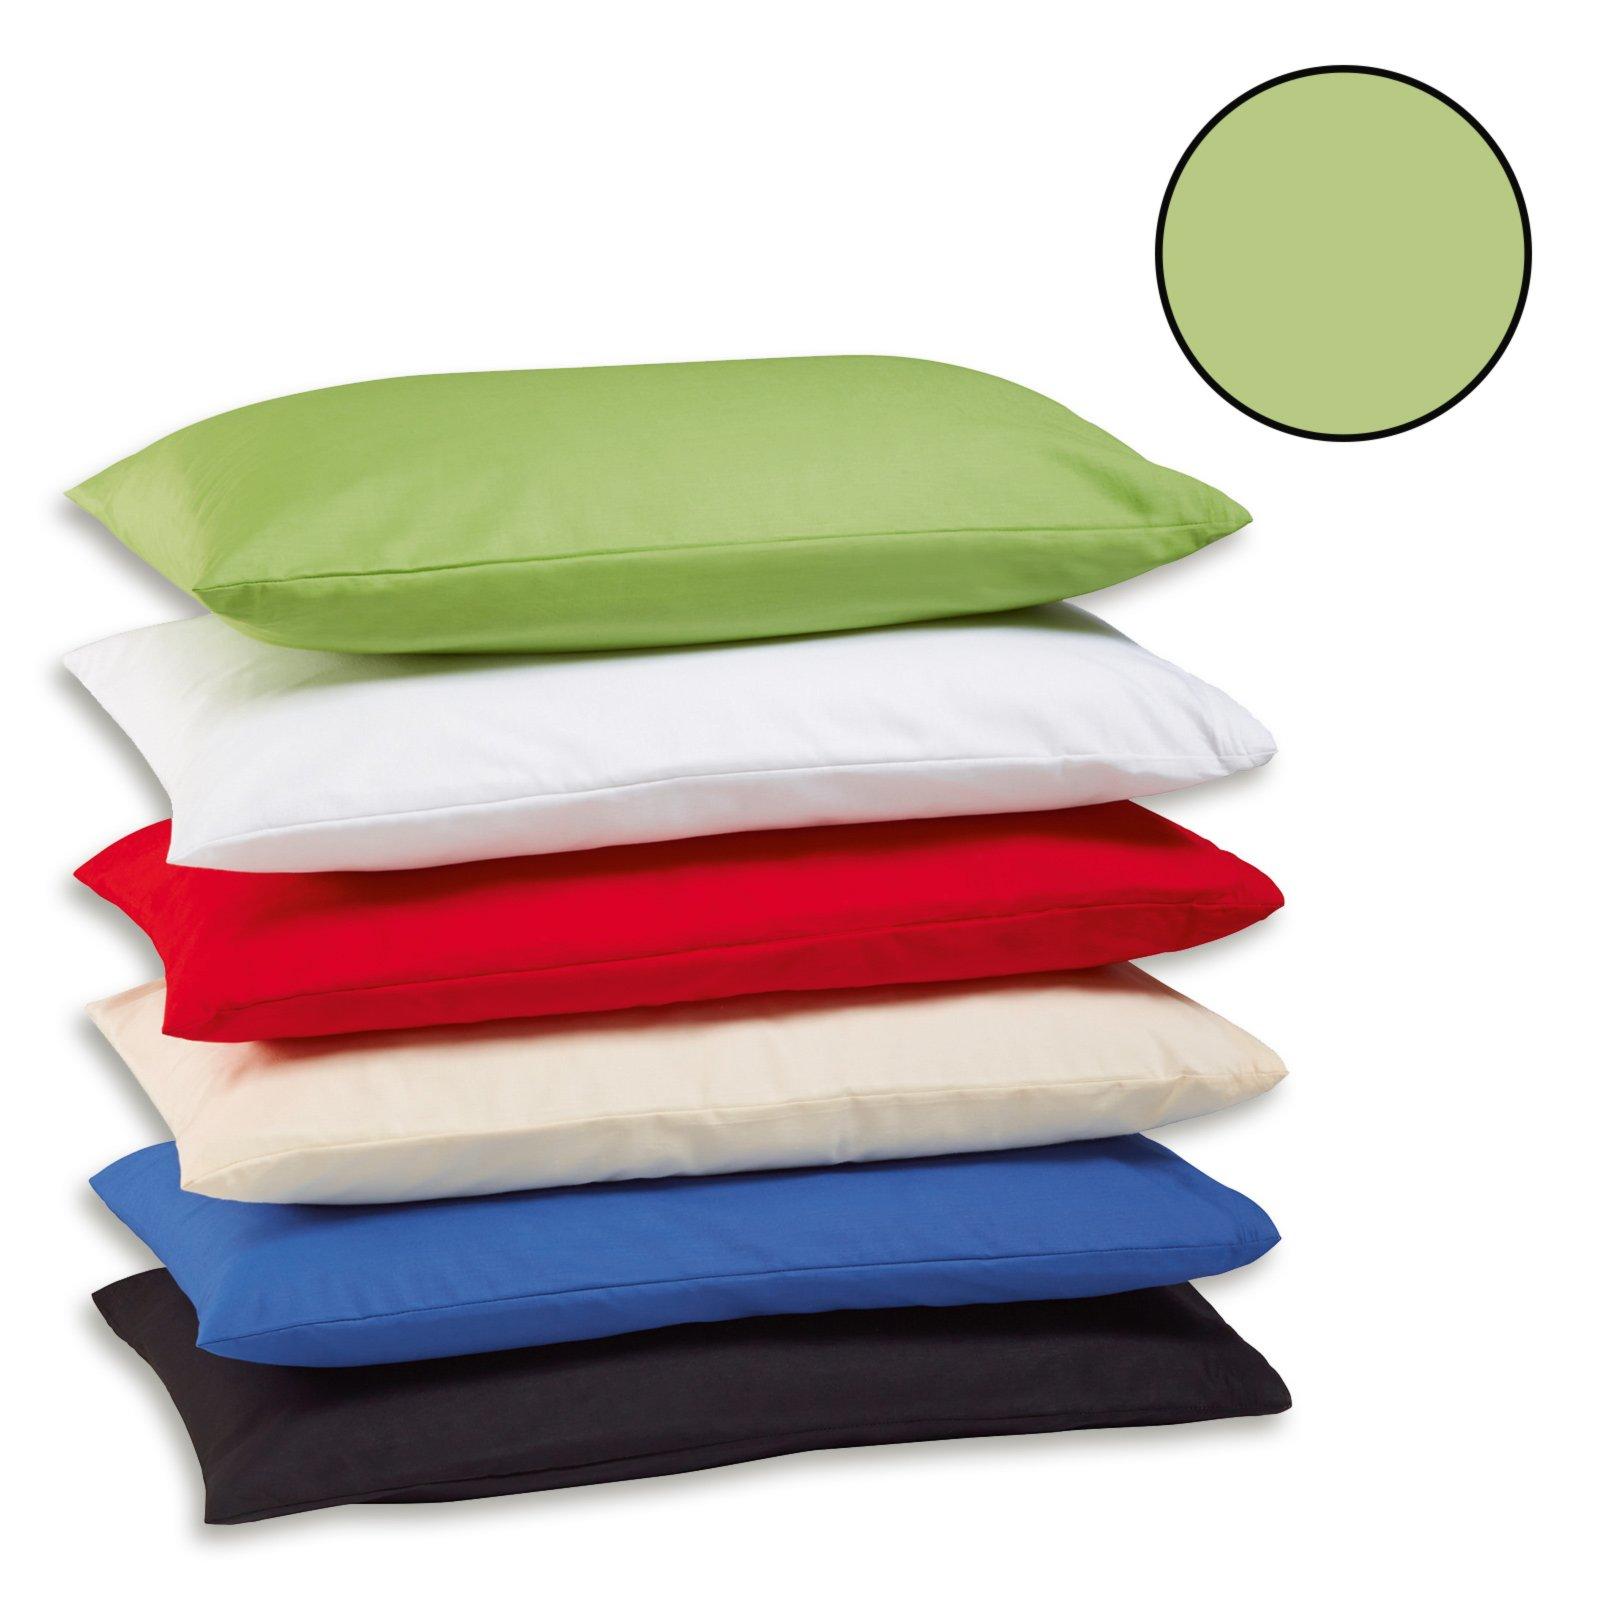 2er pack kissenbezug exclusiv gr n 40x40 cm bettw sche bettw sche bettlaken. Black Bedroom Furniture Sets. Home Design Ideas